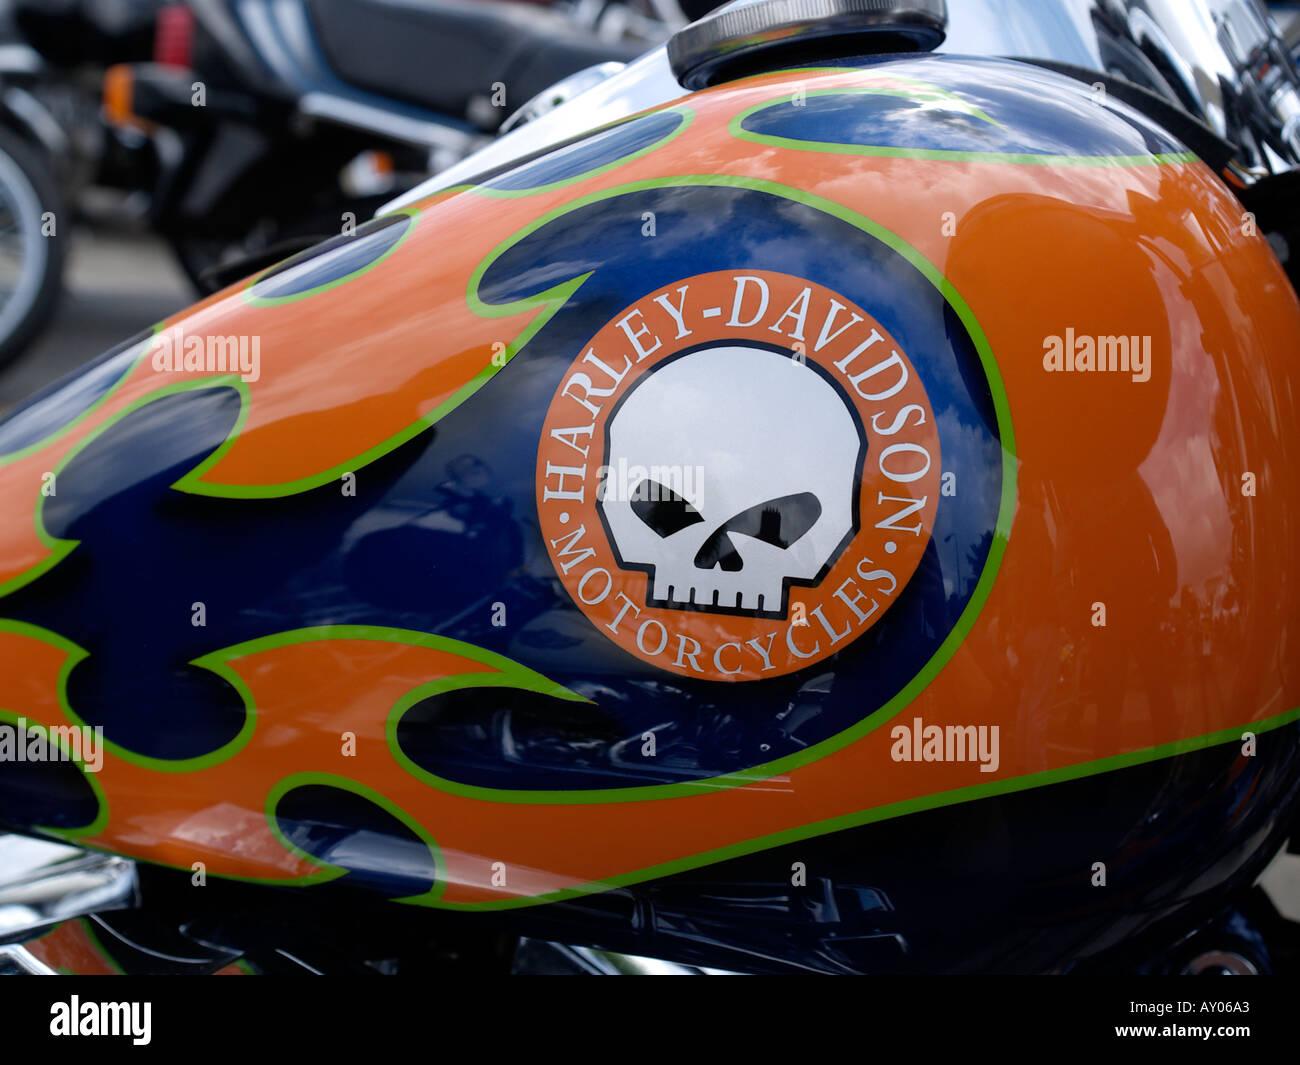 Harley Davidson Motorcycle Fuel Tank With Custom Paint Job And Logo Skull